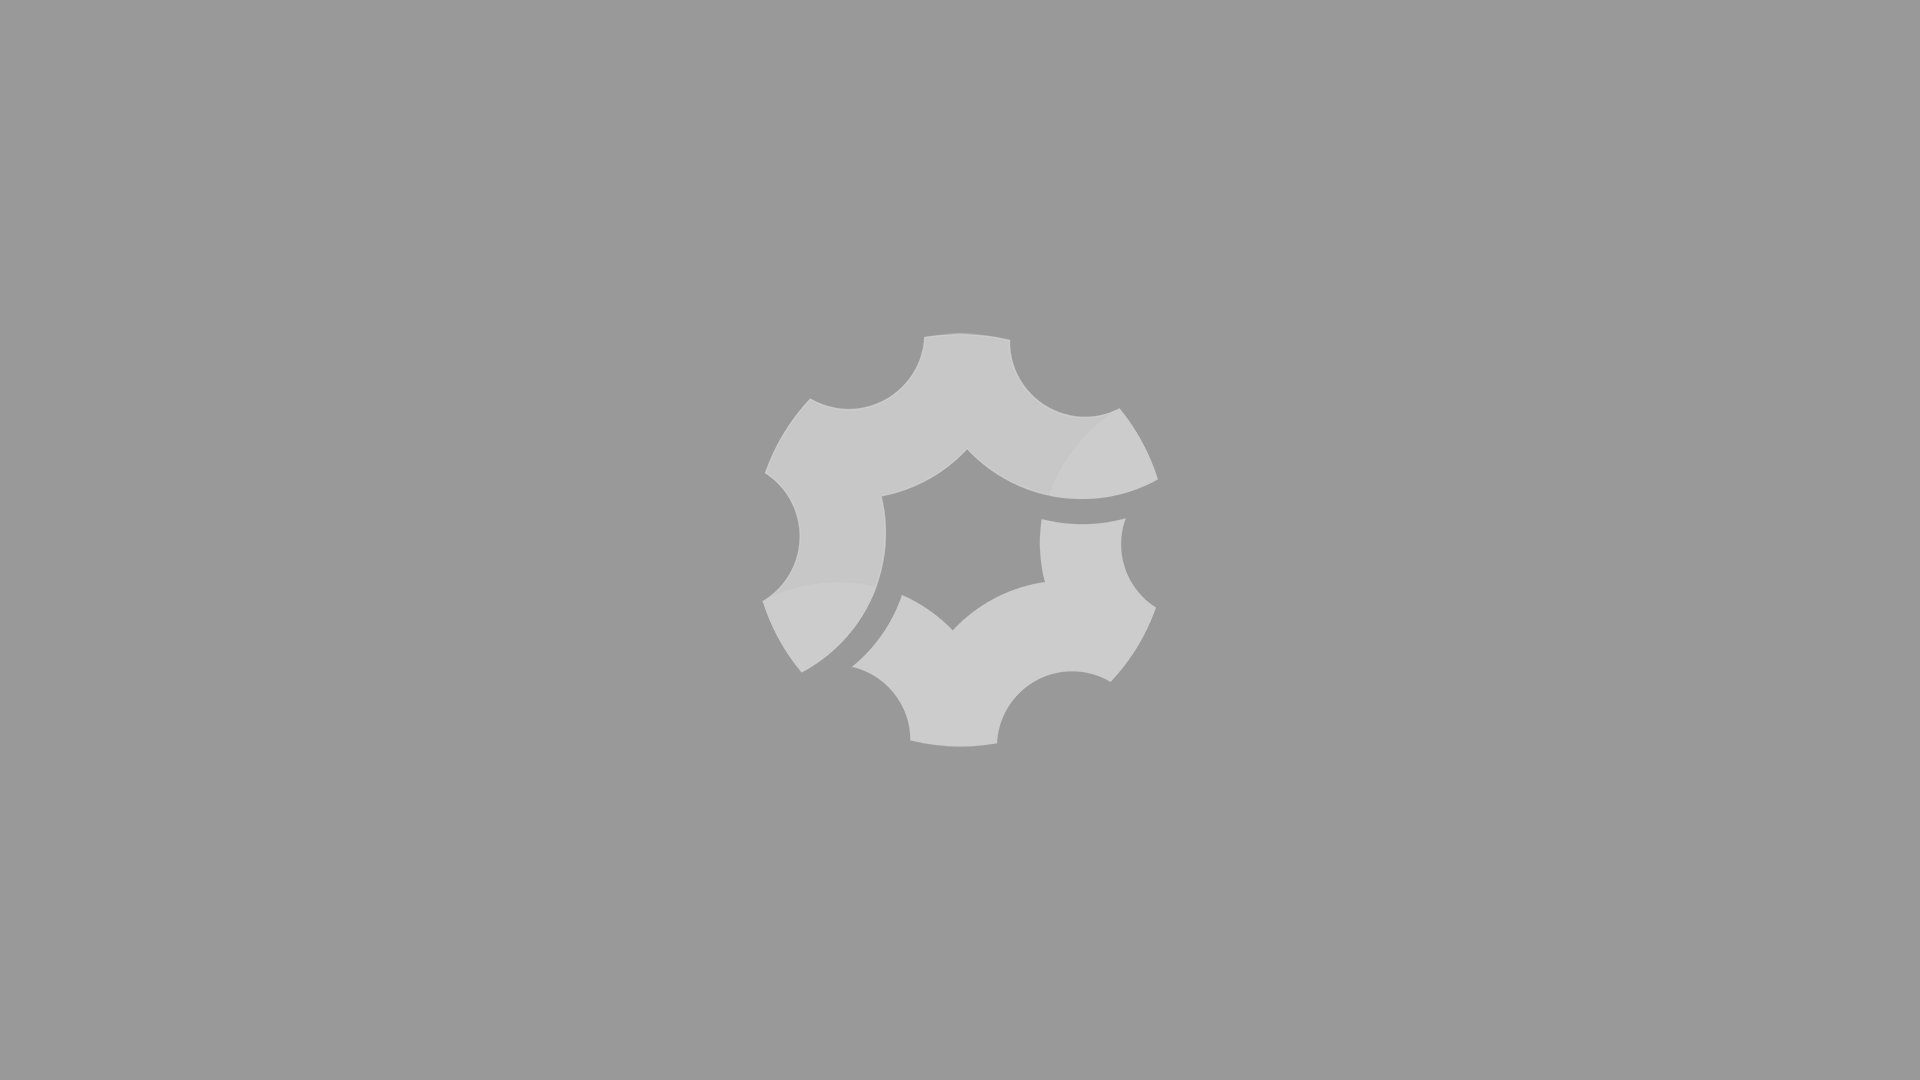 snowrunner_screenshot_2021.01.10_-_21.14.21.05.png